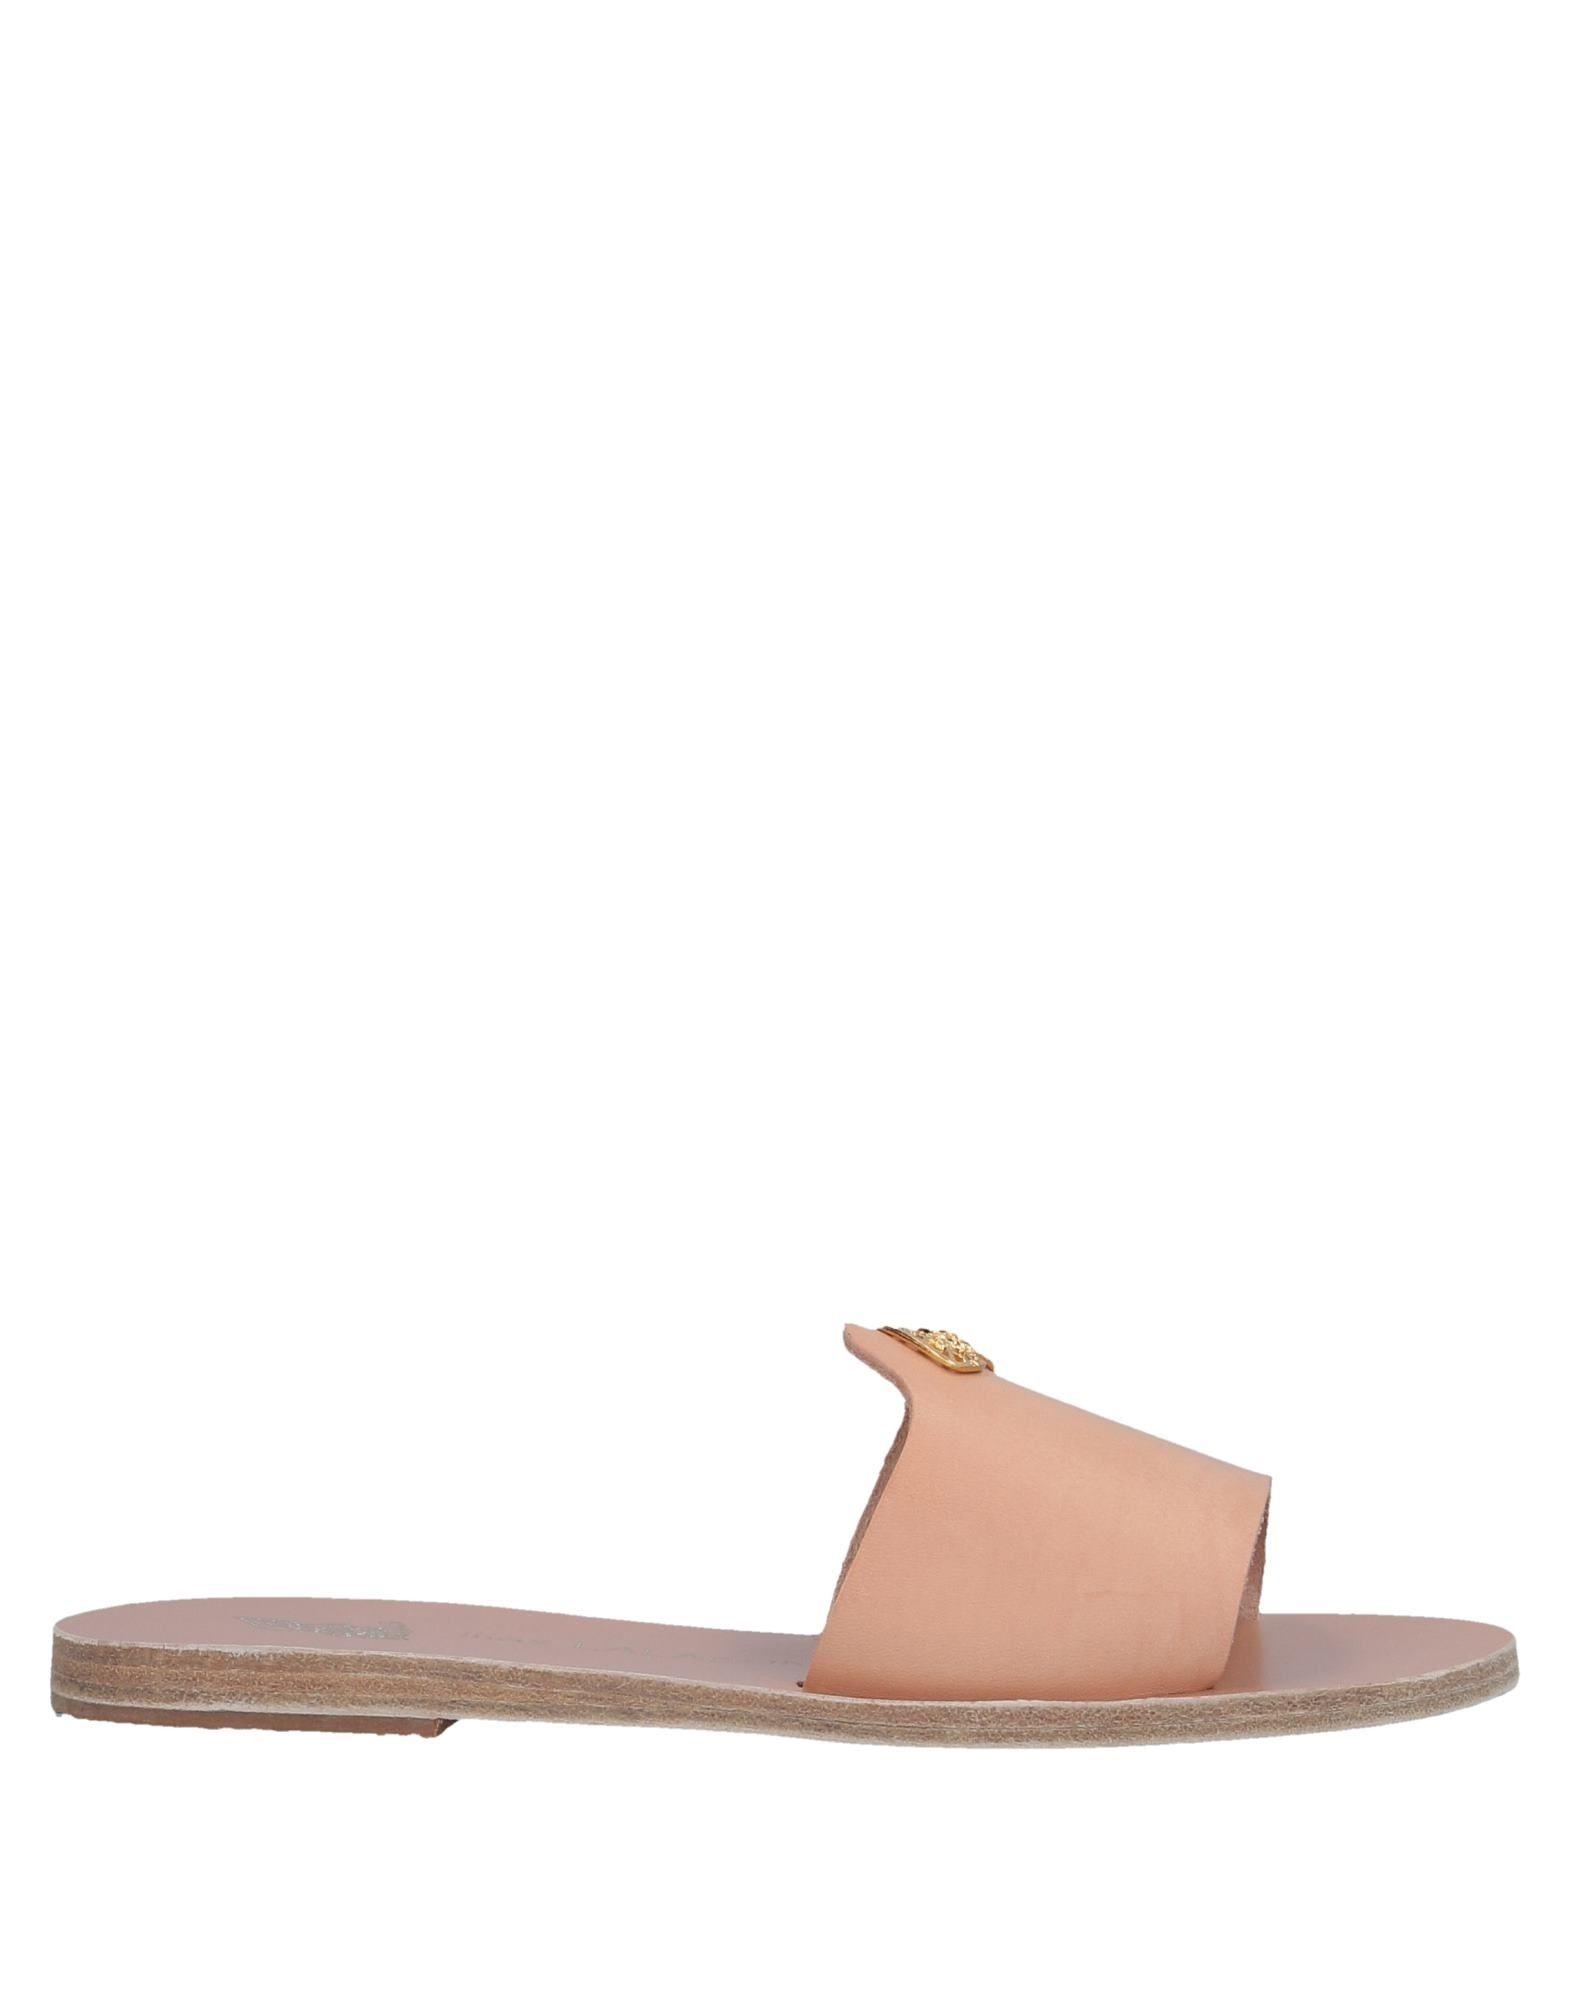 ANCIENT GREEK SANDALS x LALAoUNIS Сандалии woman high heels sandals gold chains sandals lady high heels sandals sexy open toe pumps cut outs dress nightclub shoes b160